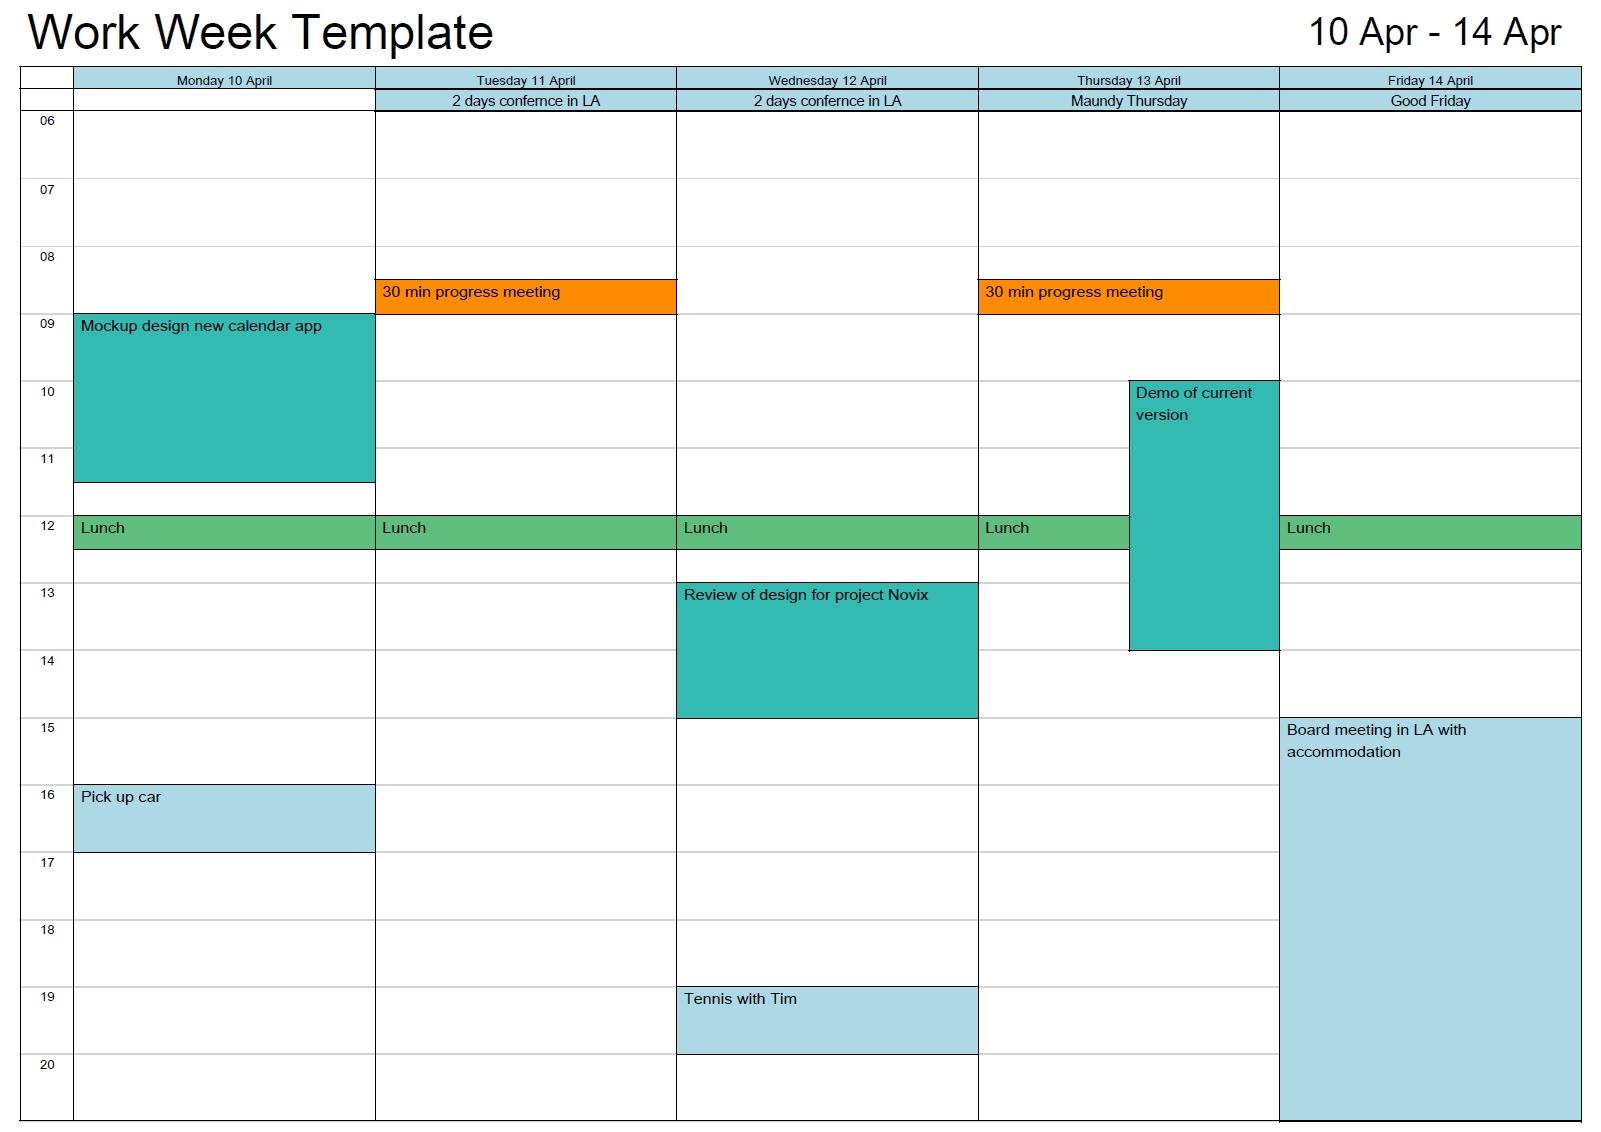 Outlook Calendar Print_Outlook Calendar Printing Templates